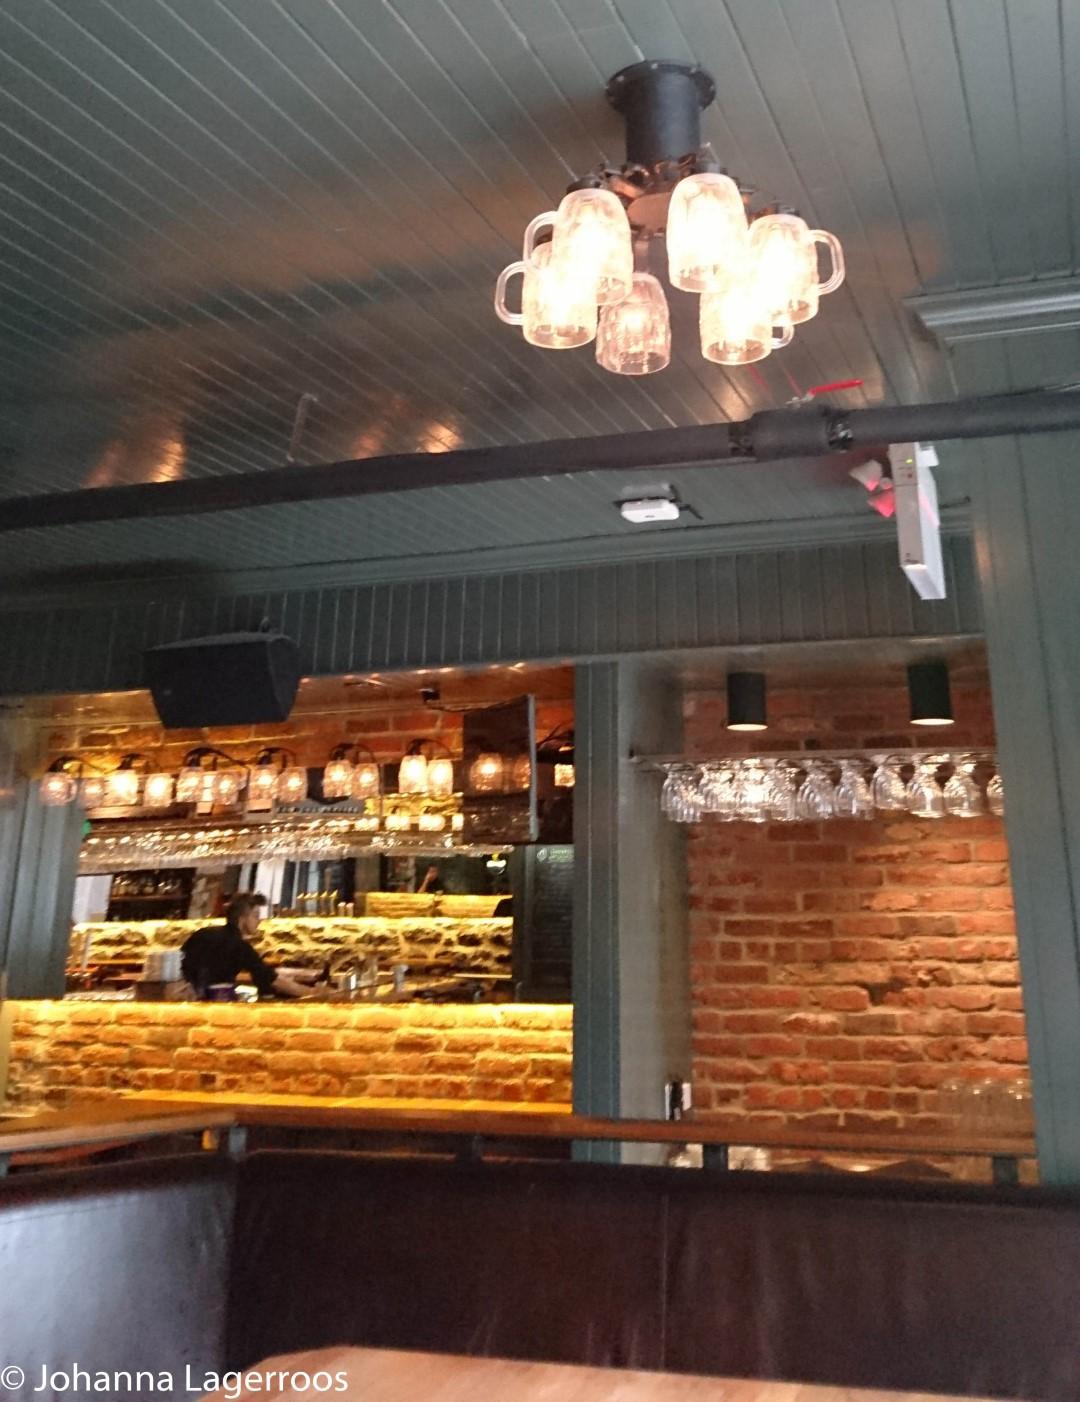 Beer glass ceiling lamp